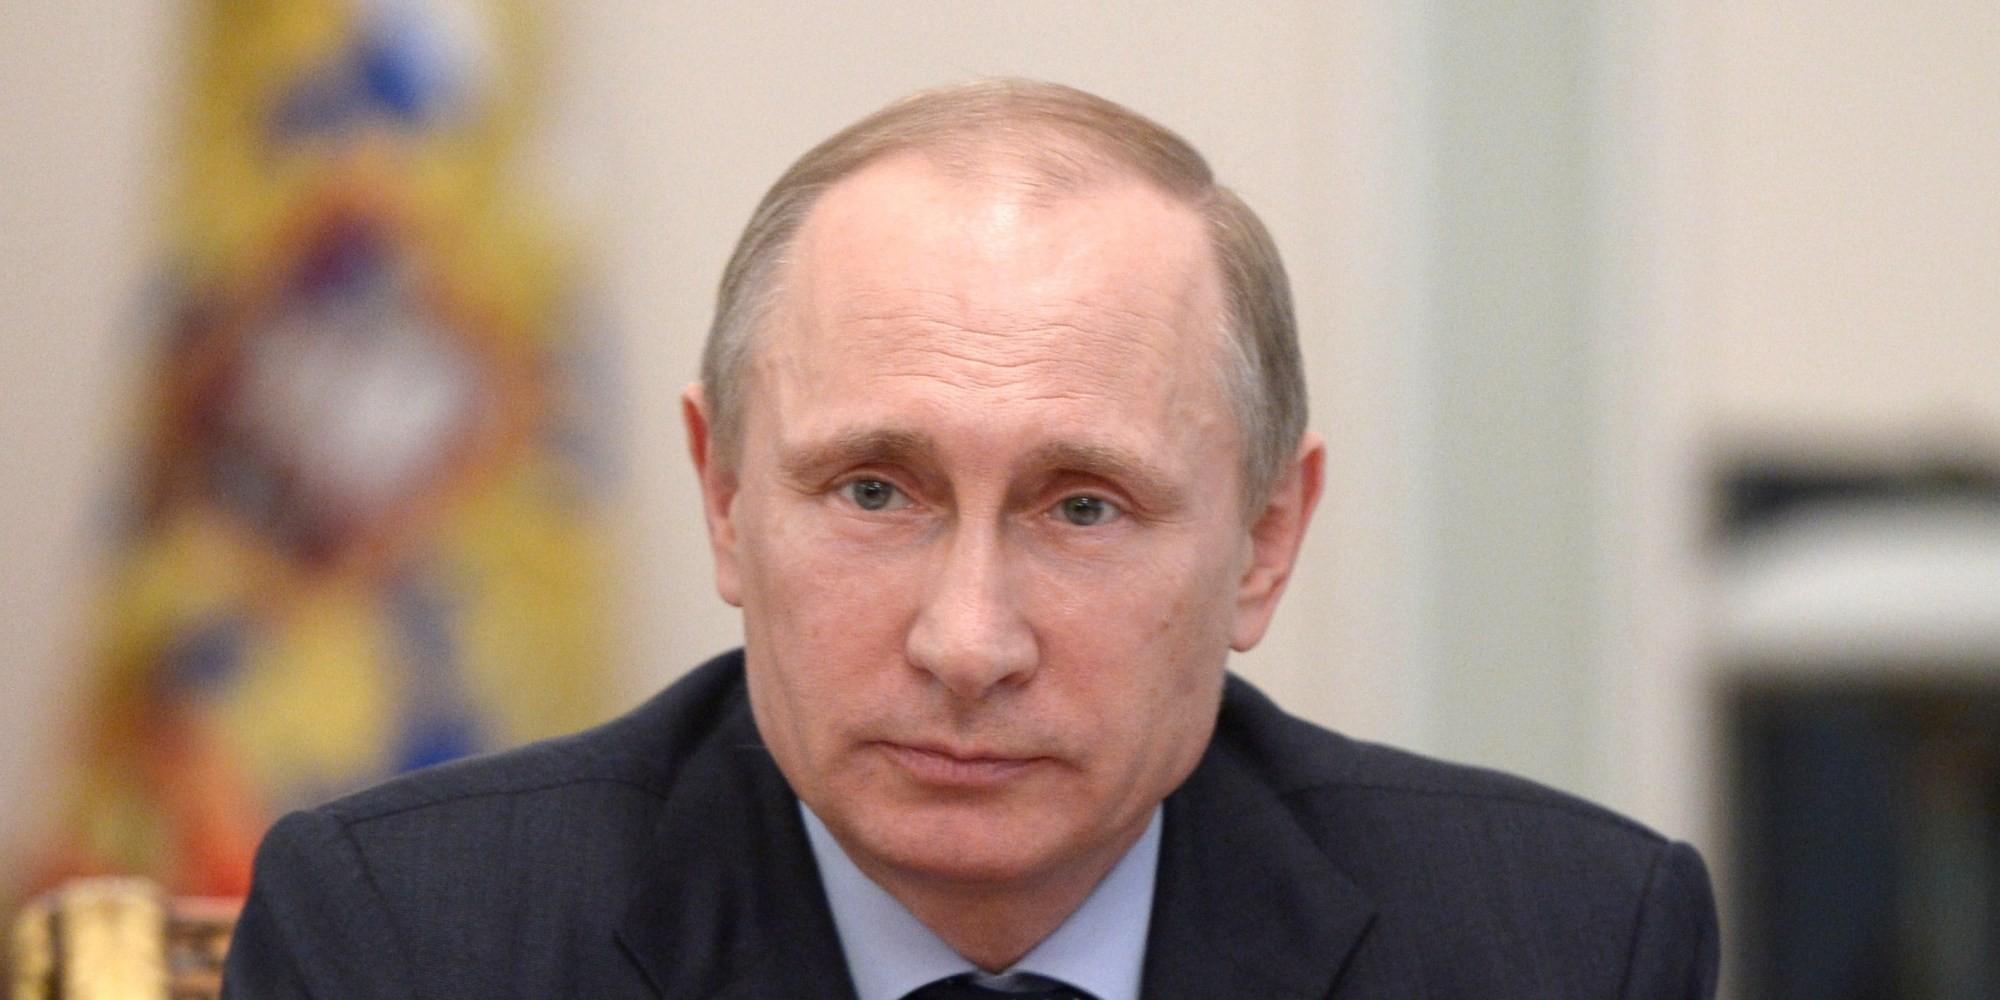 Путин подписал указ осоветниках глав думских партий